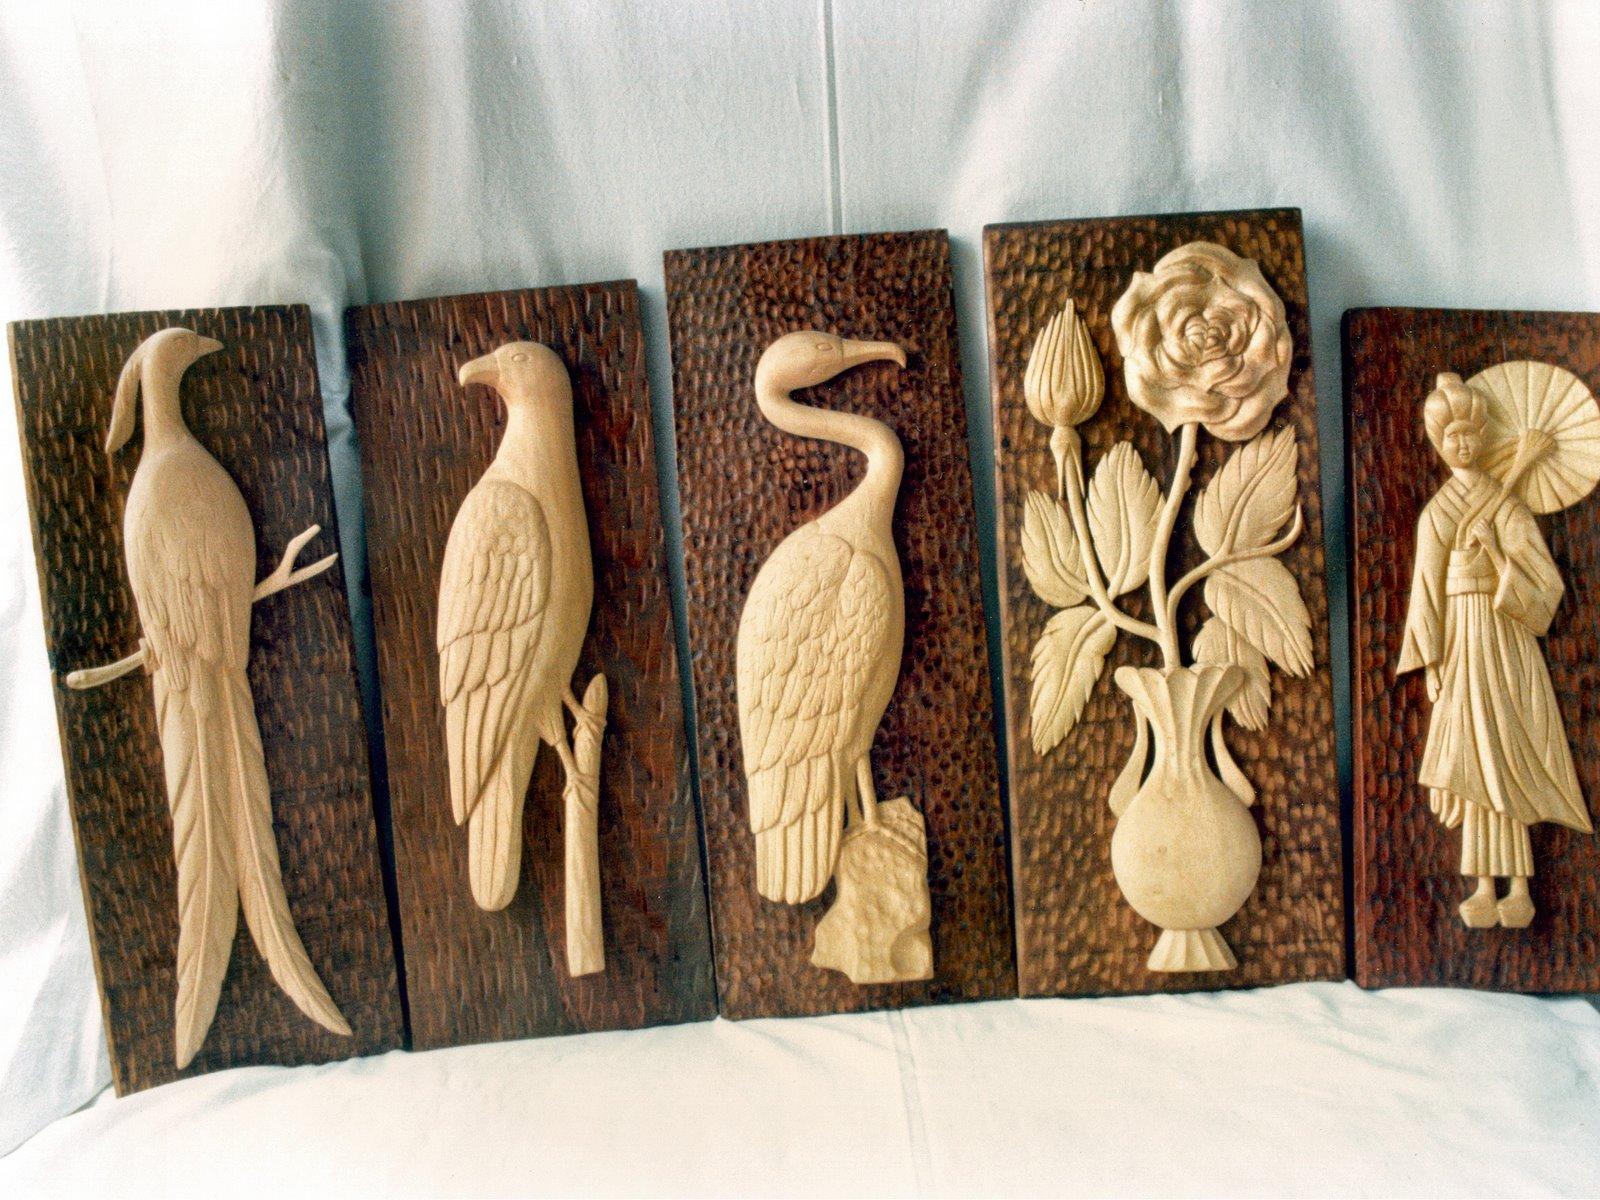 Jarr n con flores talla en madera wood carving esculturas for Fotos en madera